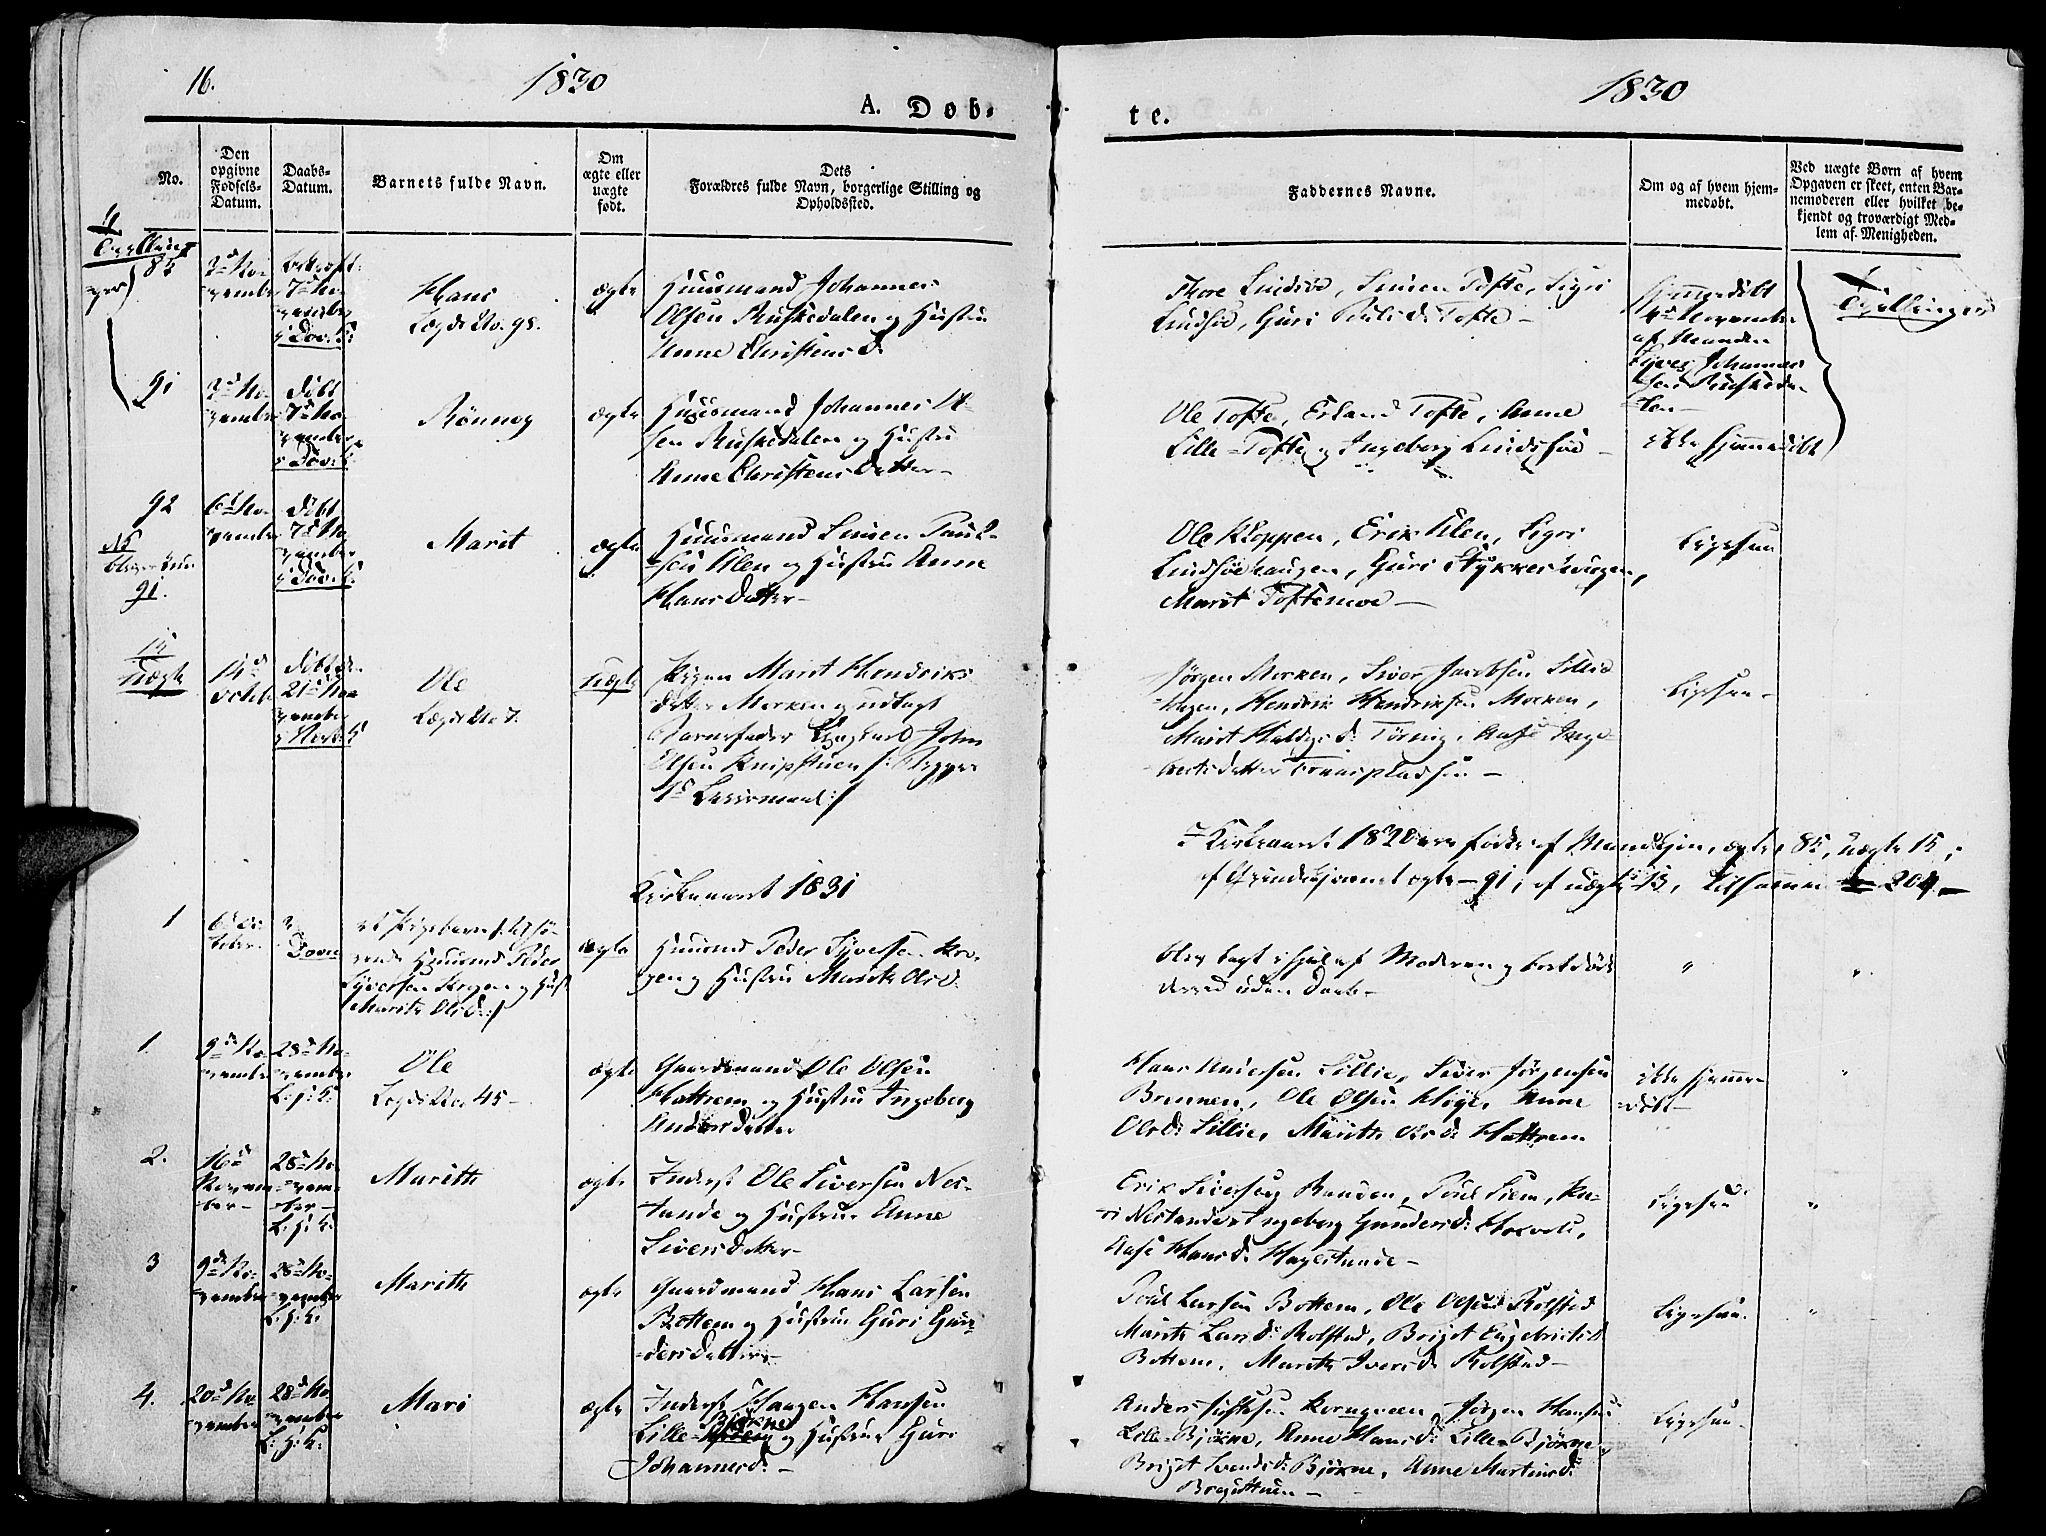 SAH, Lesja prestekontor, Ministerialbok nr. 5, 1830-1842, s. 16